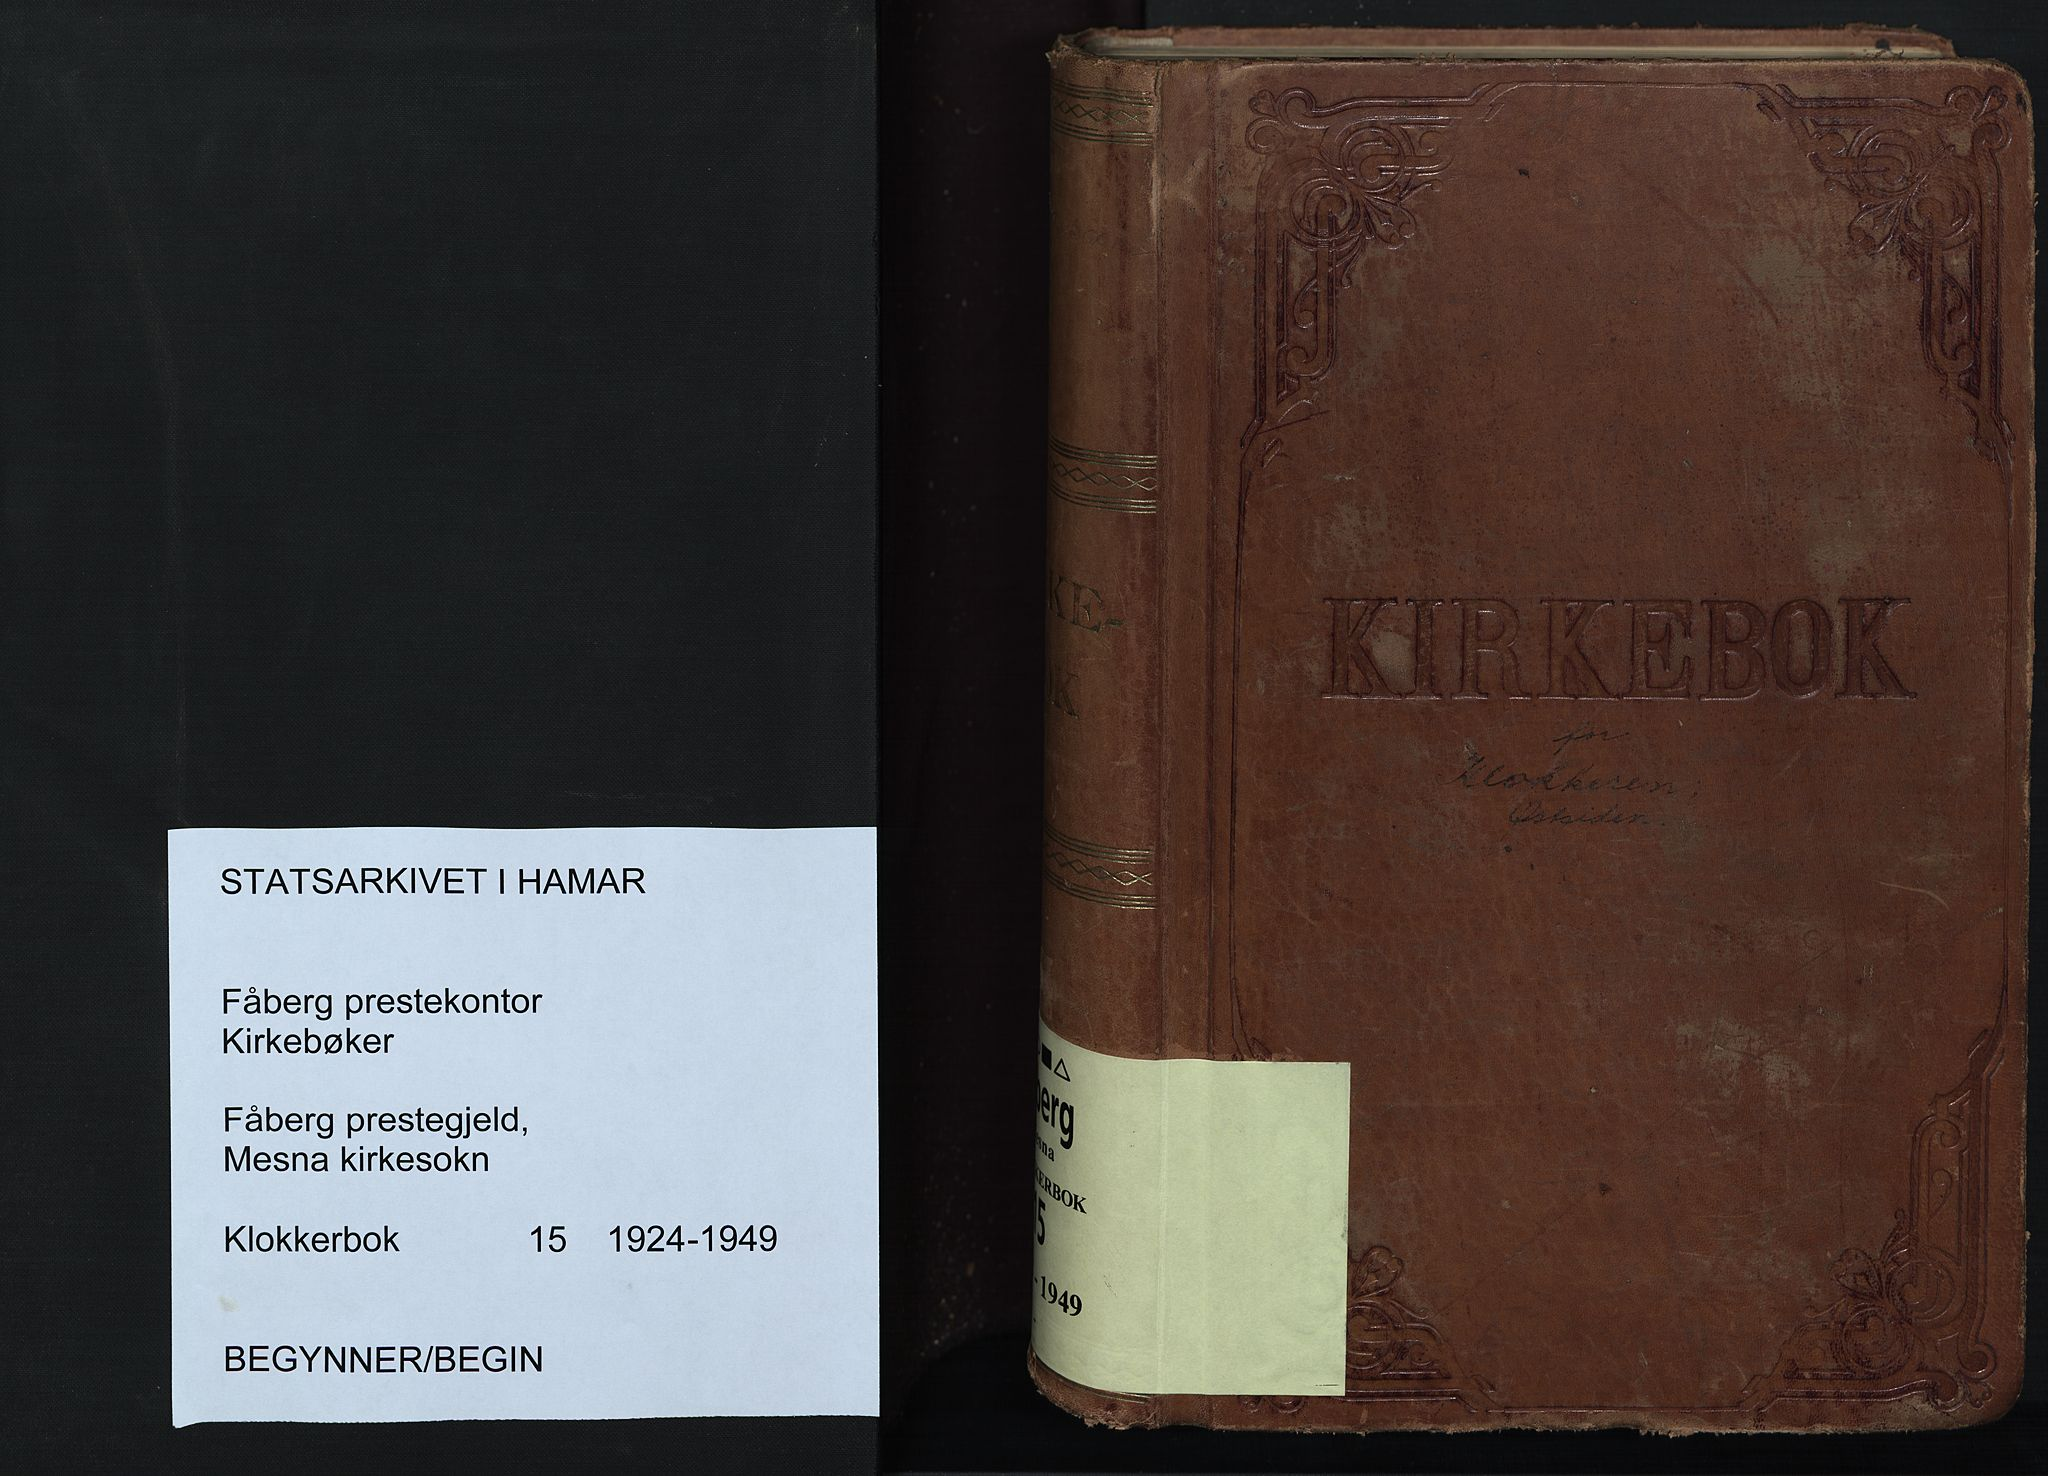 SAH, Fåberg prestekontor, H/Ha/Hab/L0015: Parish register (copy) no. 15, 1924-1949